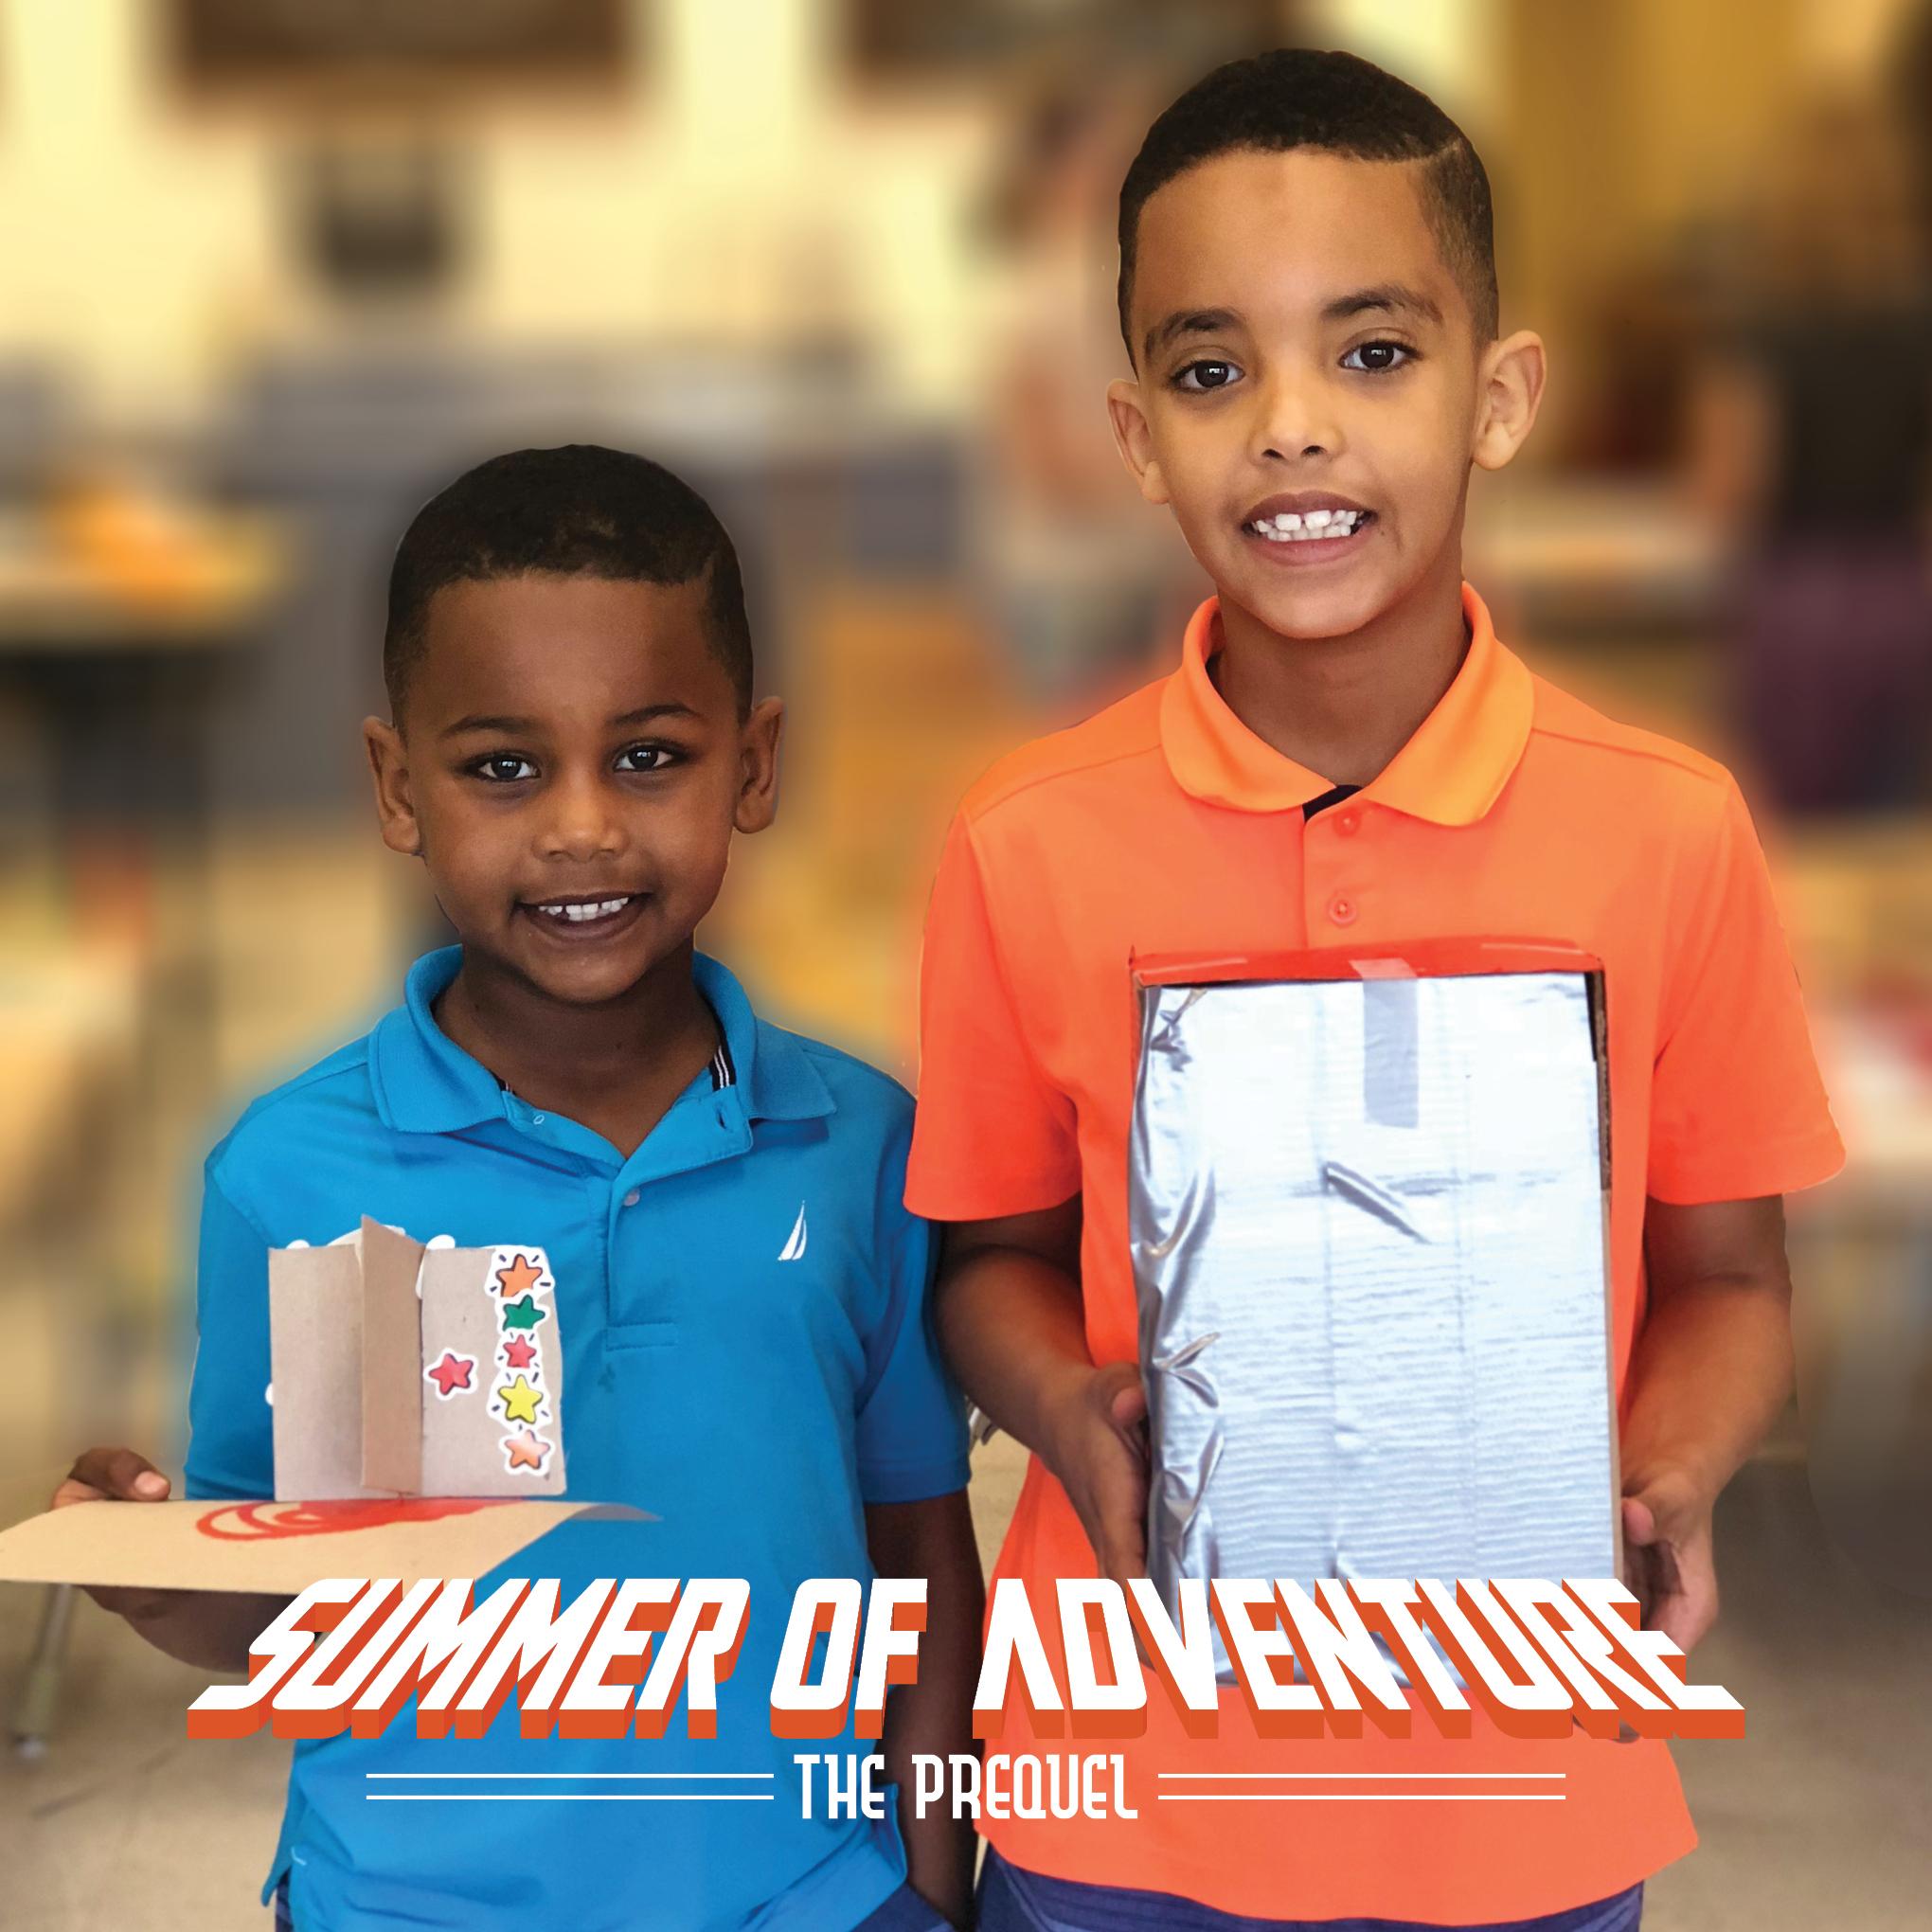 Denver Public Library Summer of Adventure 2020: The Prequel